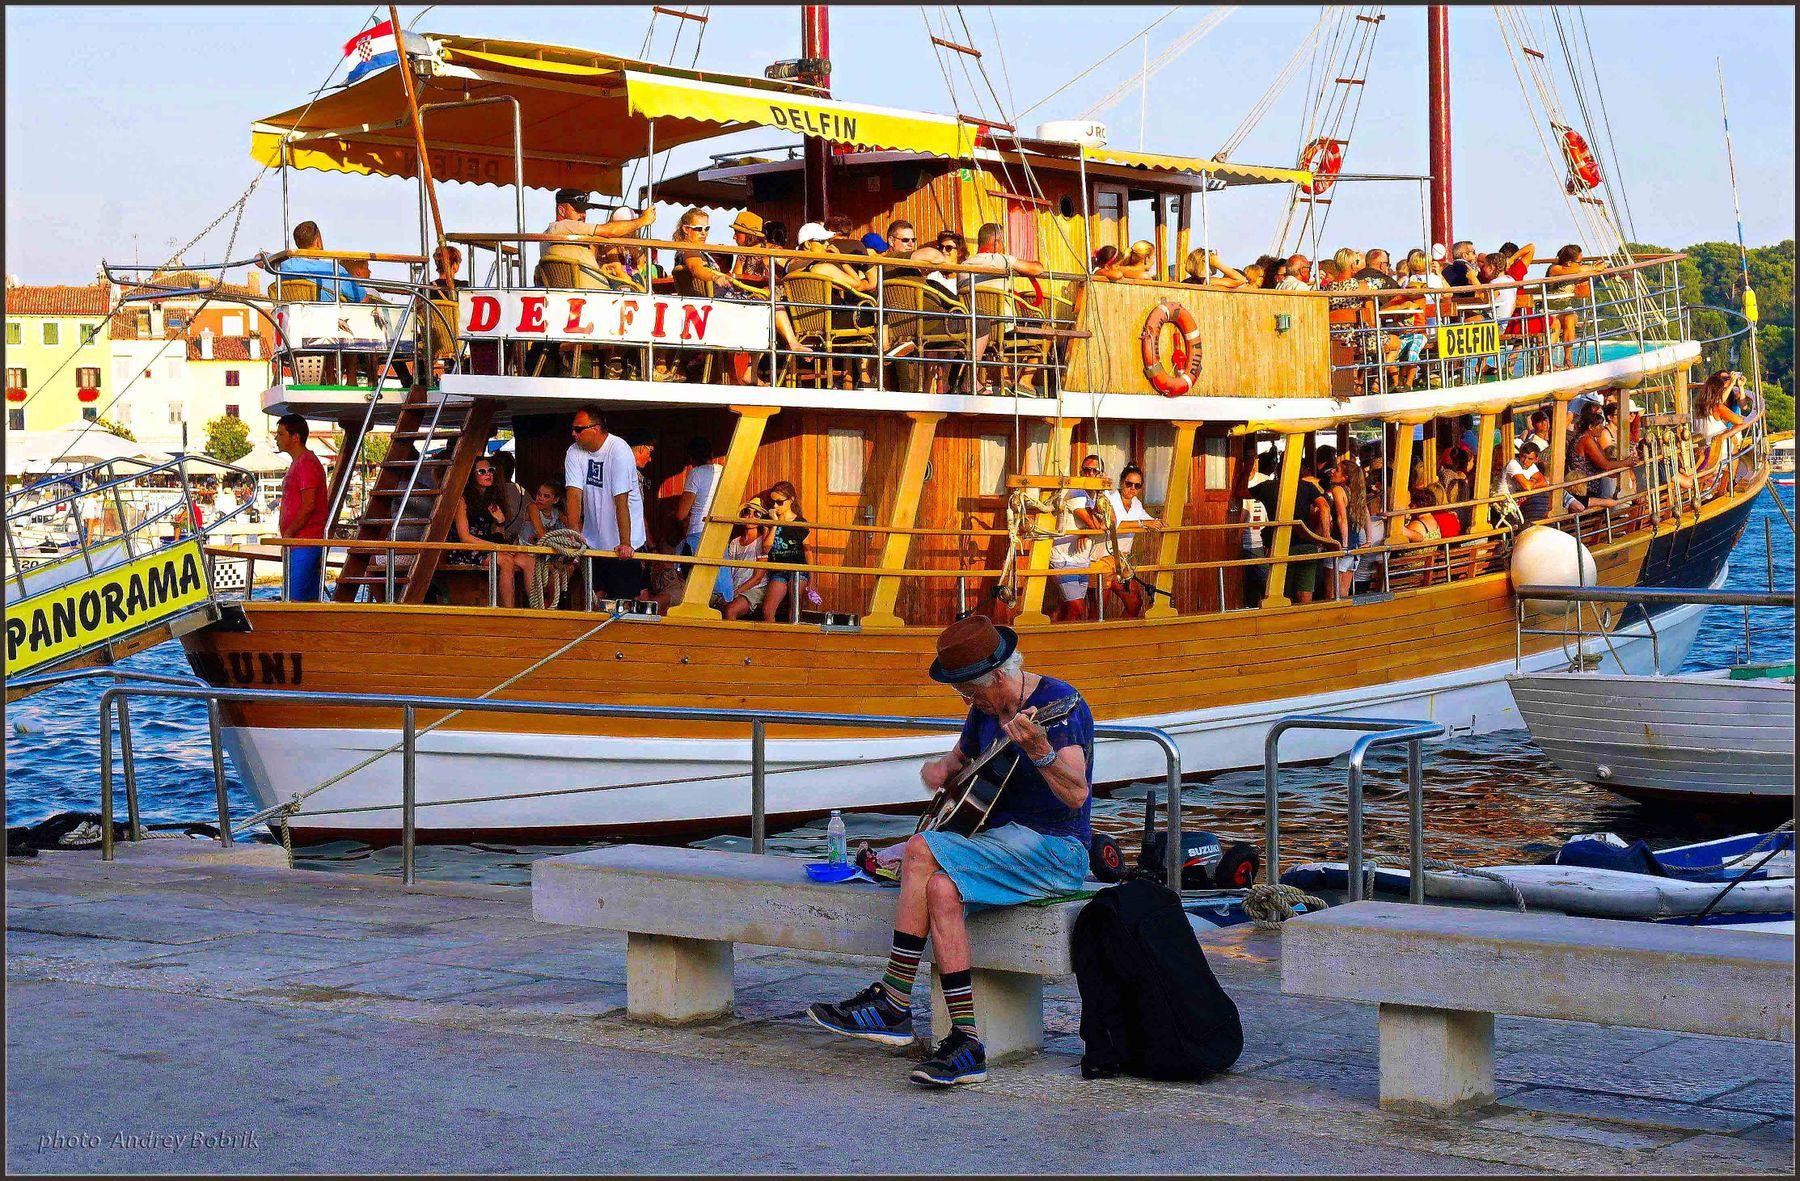 """Как провожают..."" Хорватия Ровинь море причал гавань гитарист люди шхуна"